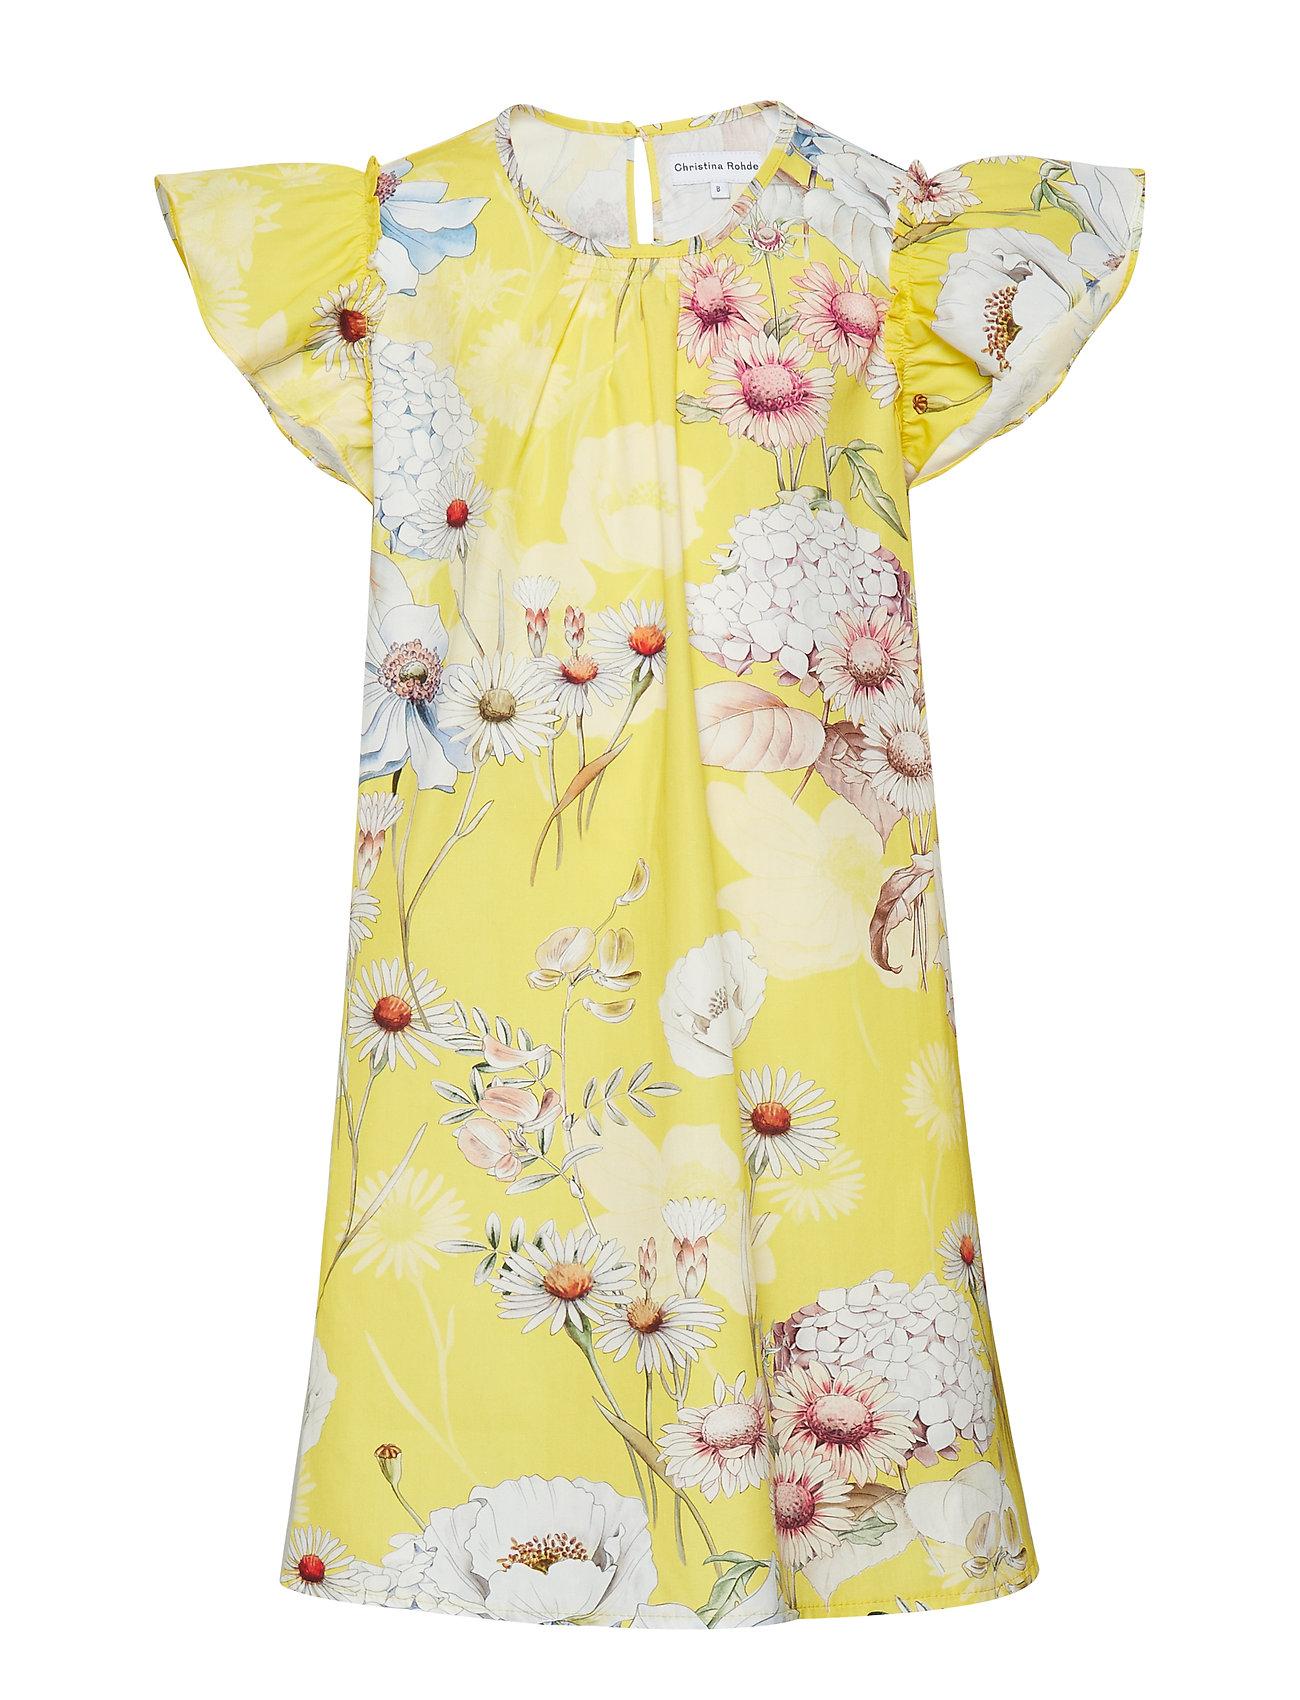 Image of Dress No. 101 Kjole Gul Christina Rohde (3123580533)